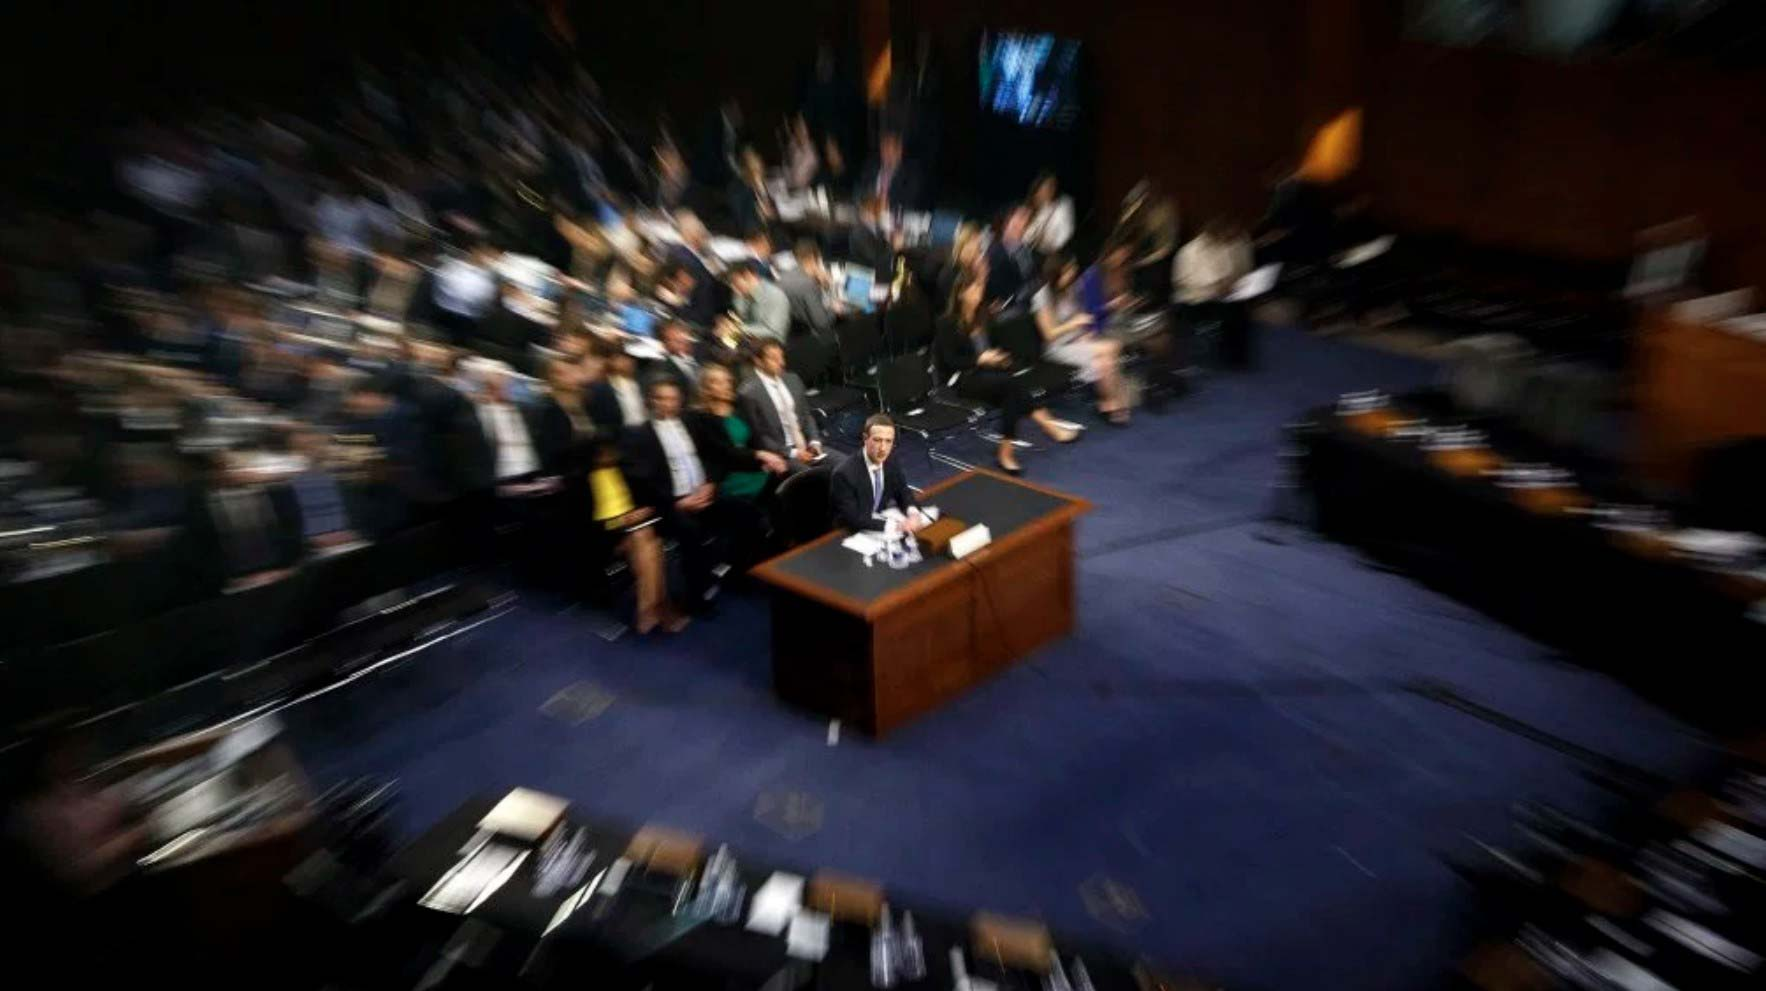 Mark Zuckerberg on the Congressional Hot Seat